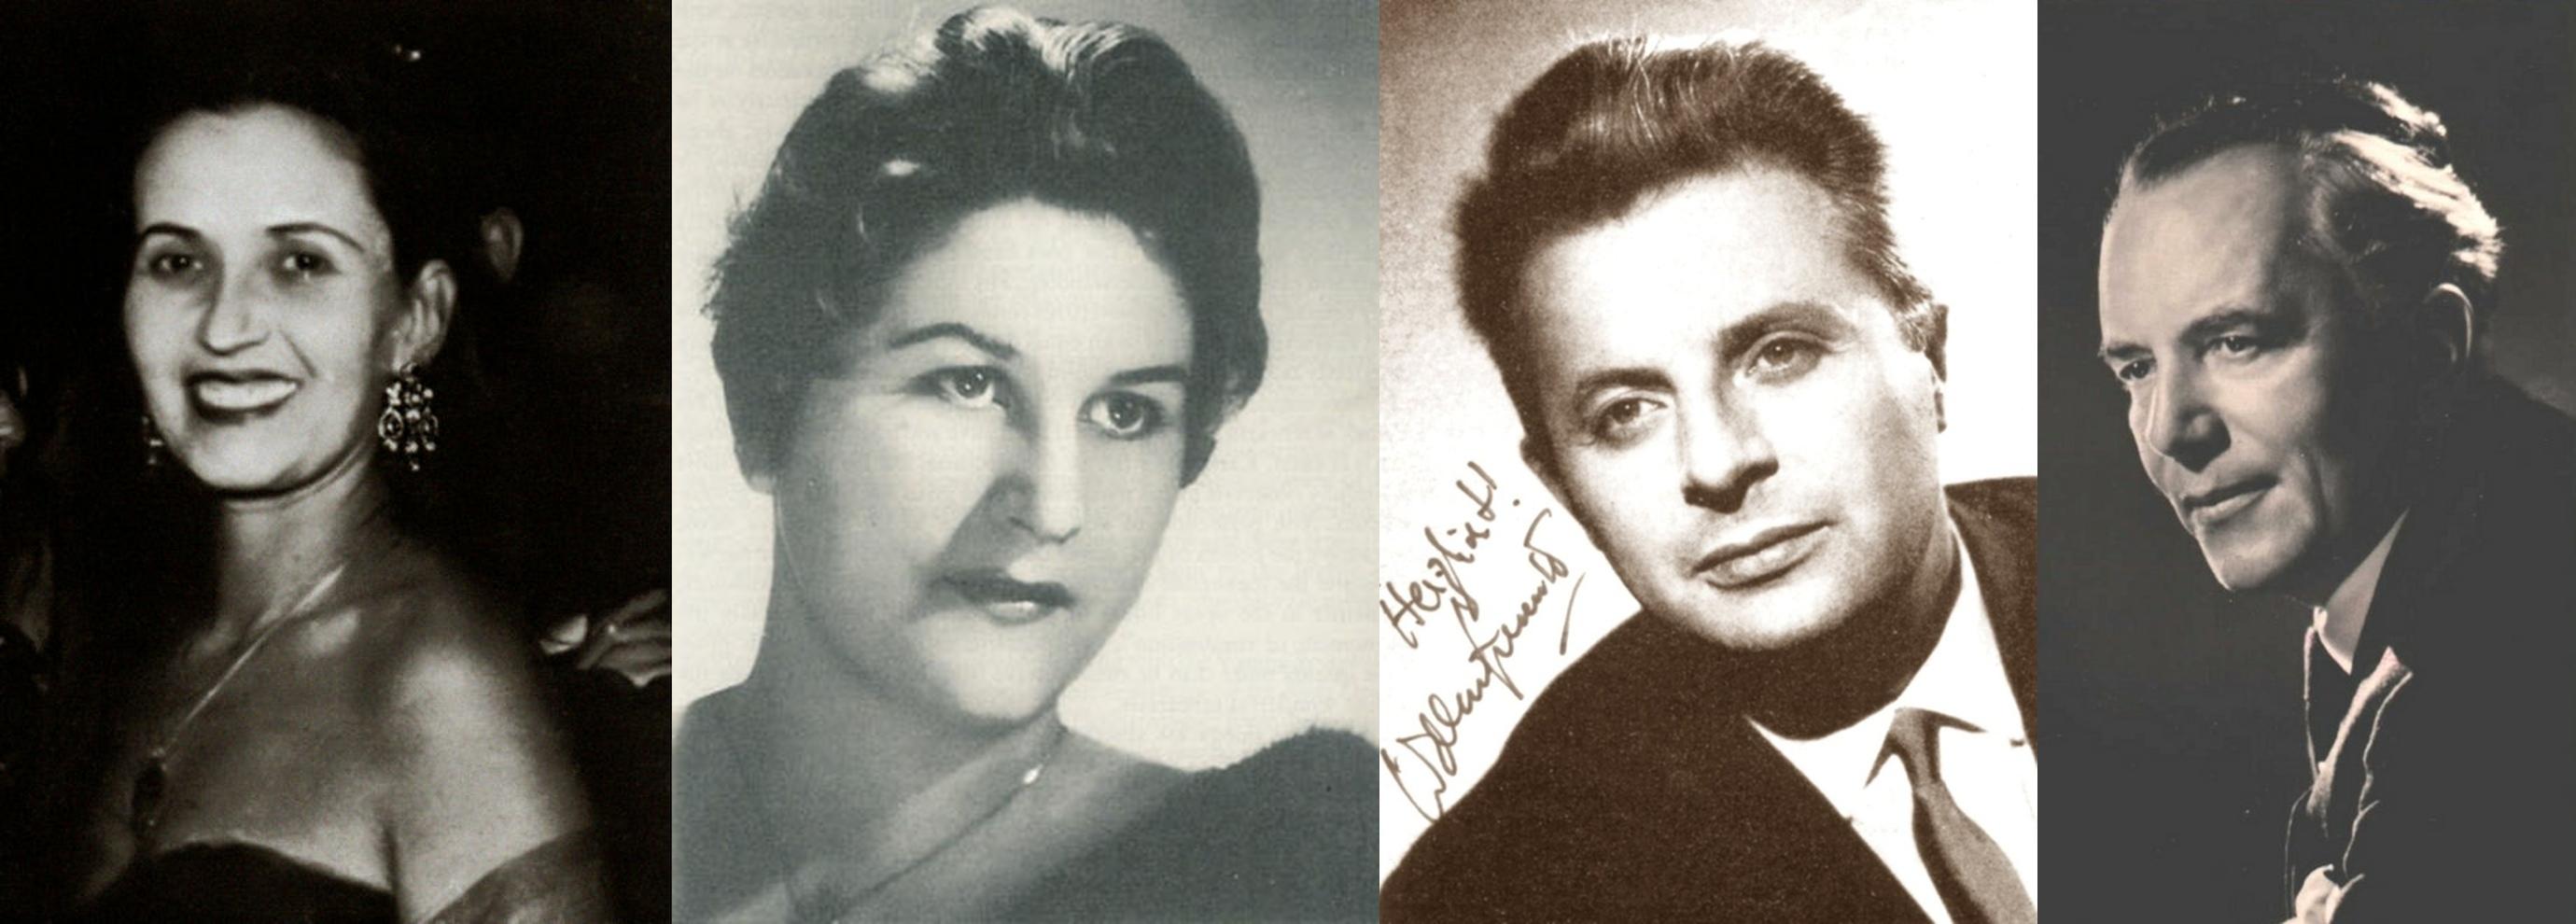 De gauche à droite: Magda László (S), Hilde Rössel-Majdan (A), Waldemar Kmentt (T), Alfred Poell (B)